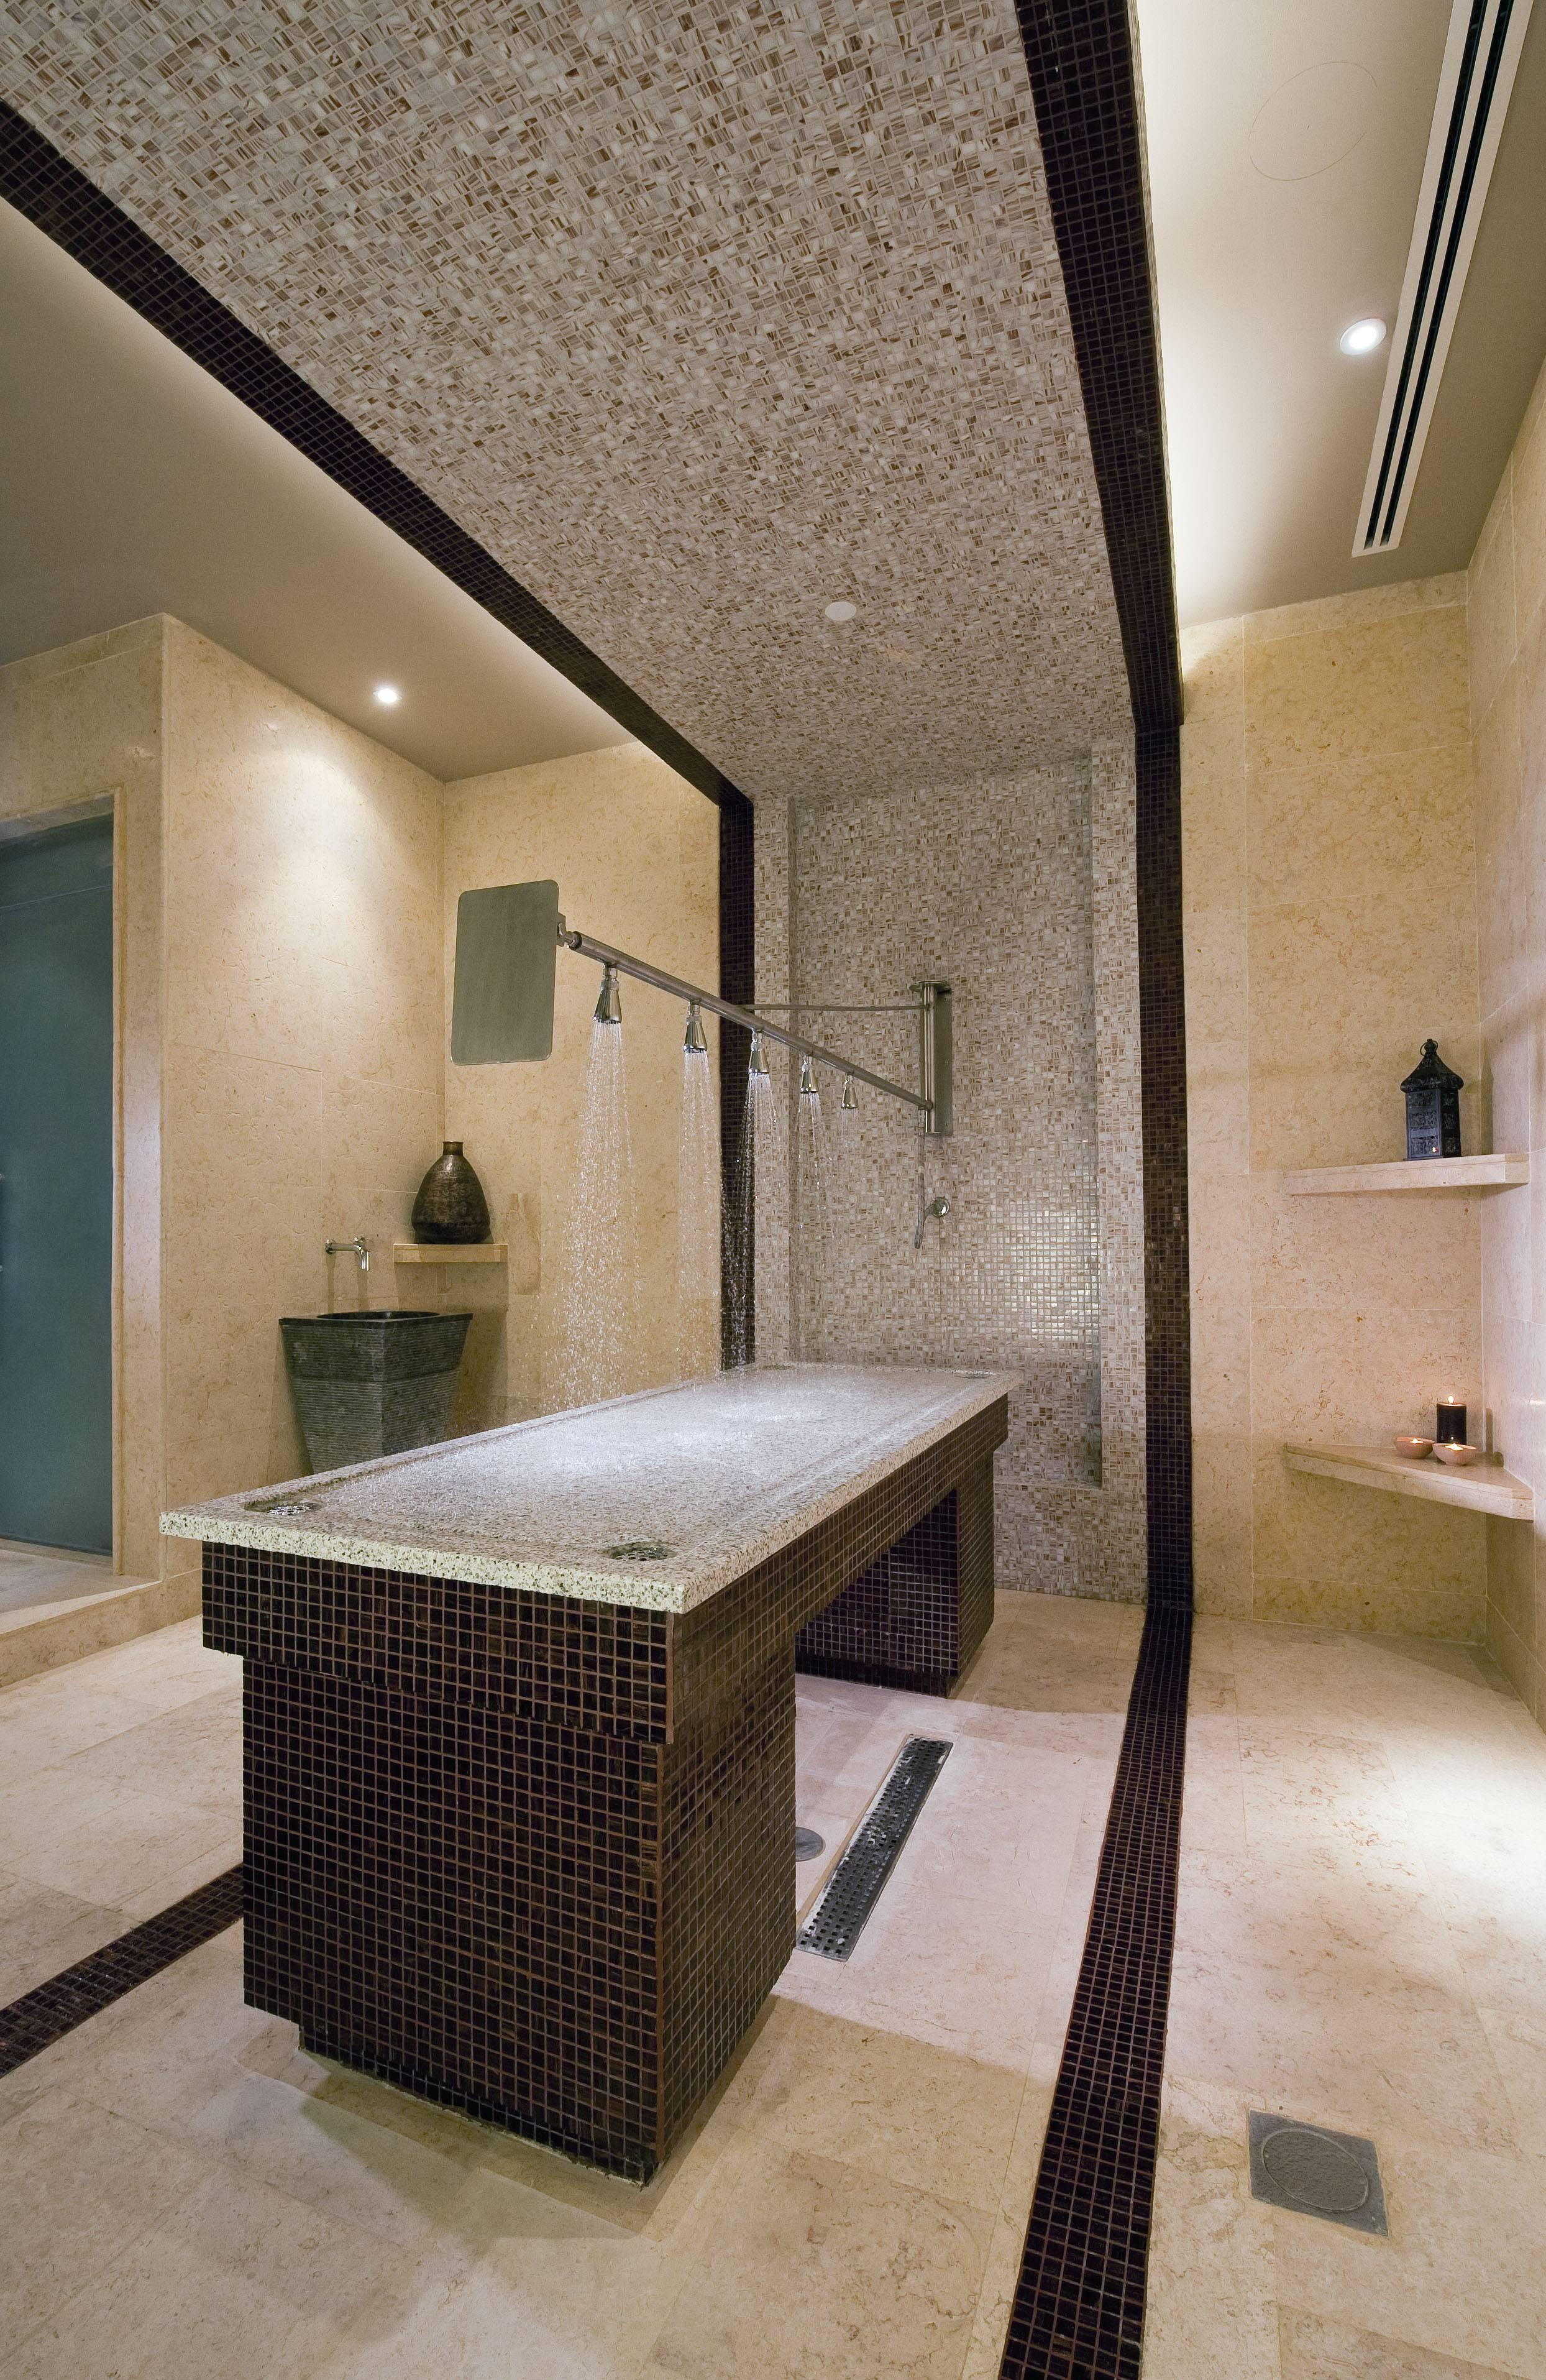 The Vichy Shower Experience Balance Wellness 360